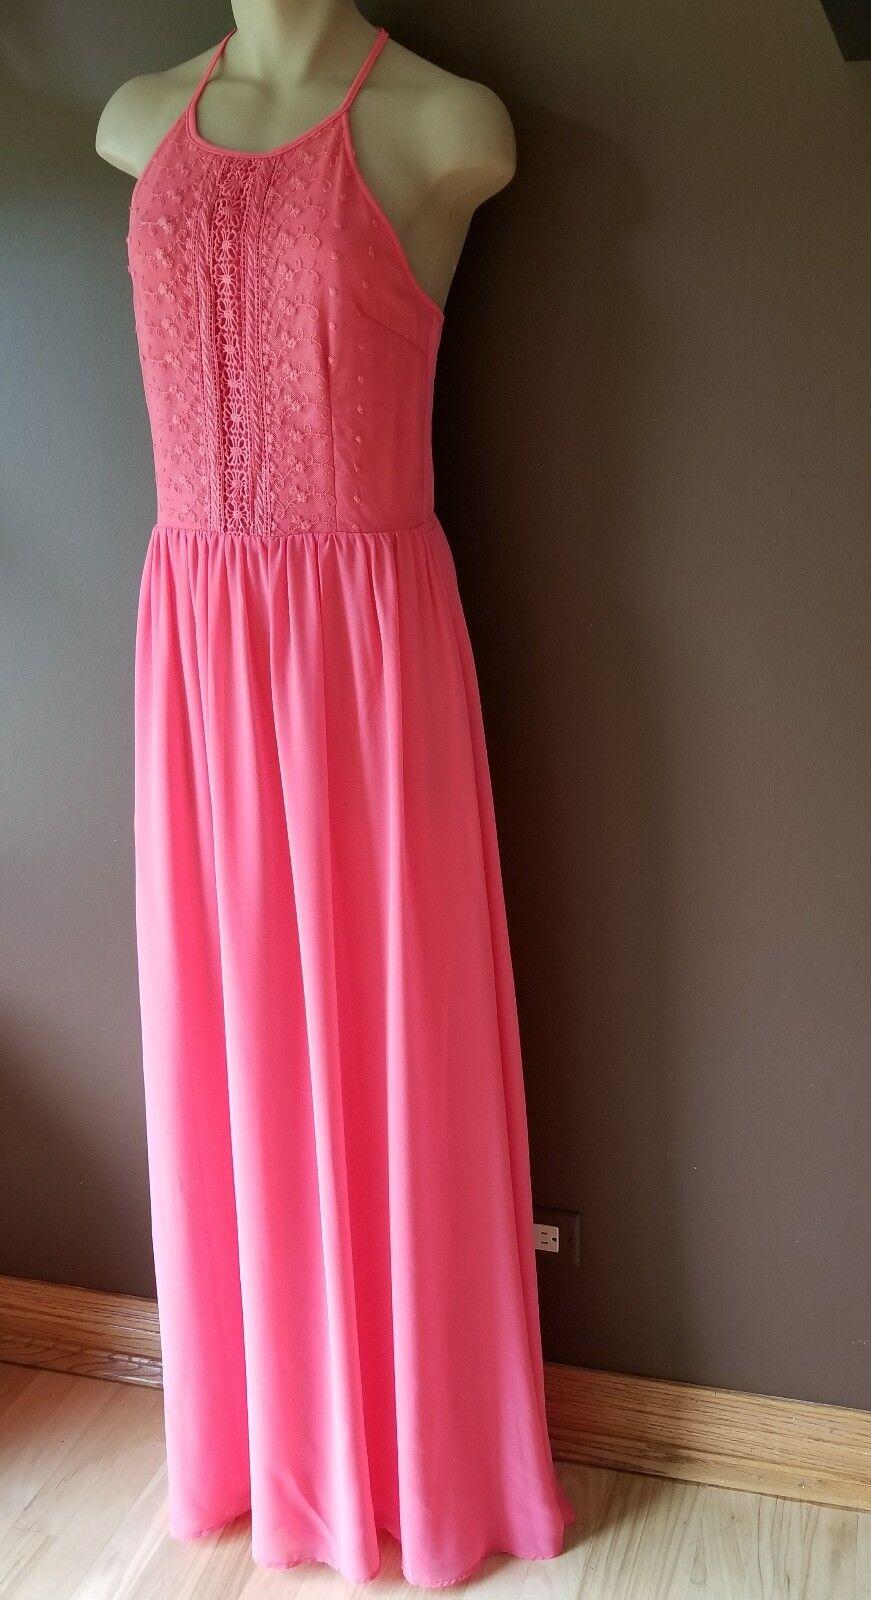 Marineblue maxi pink dress, Sz small